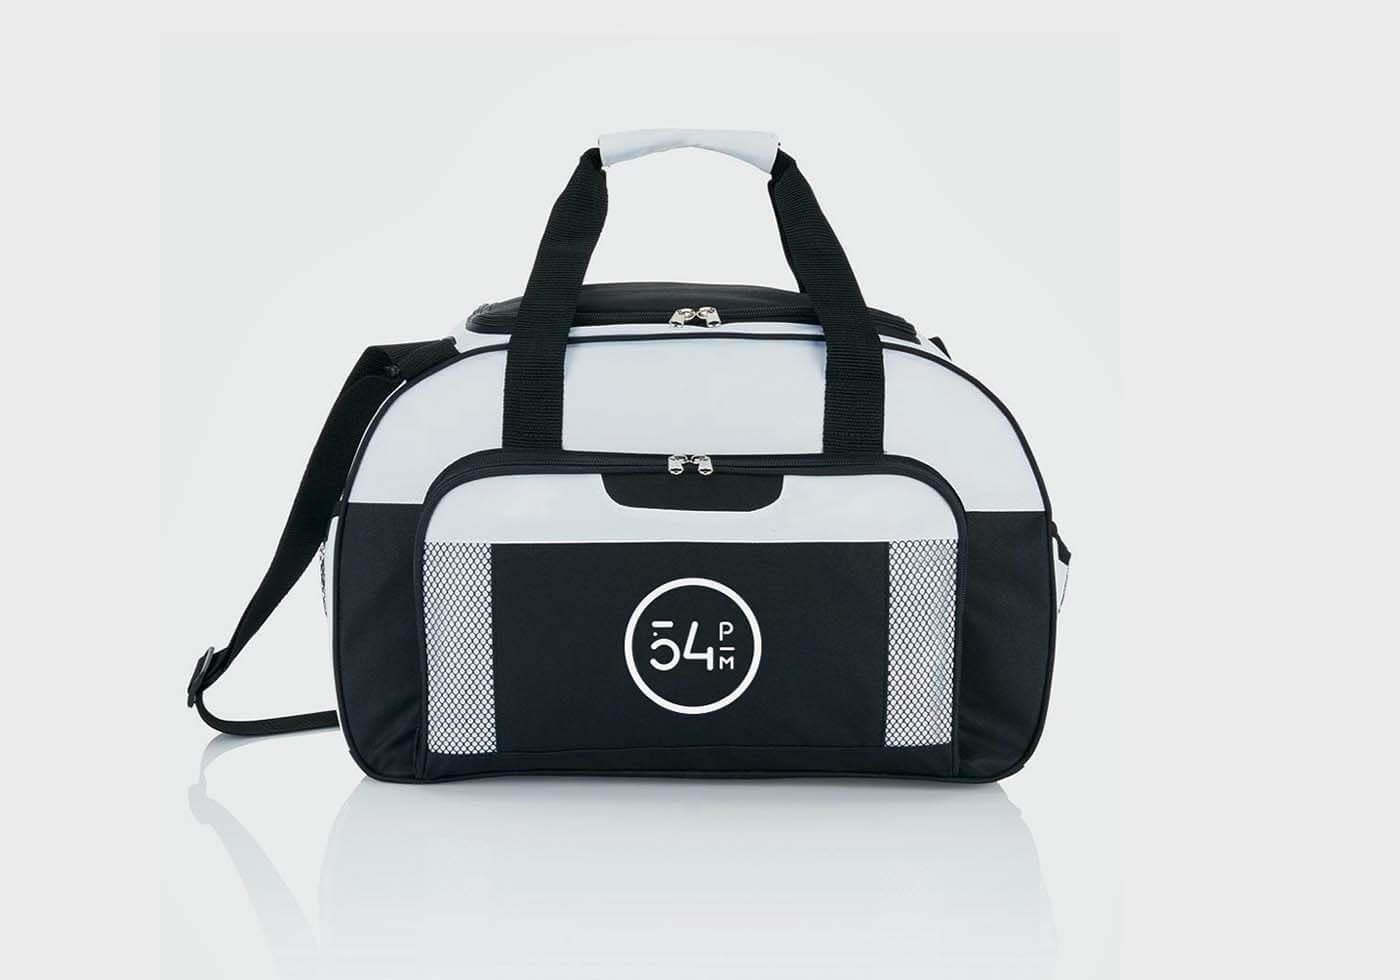 Un sac 54PM au prix de 34,90€ TTC